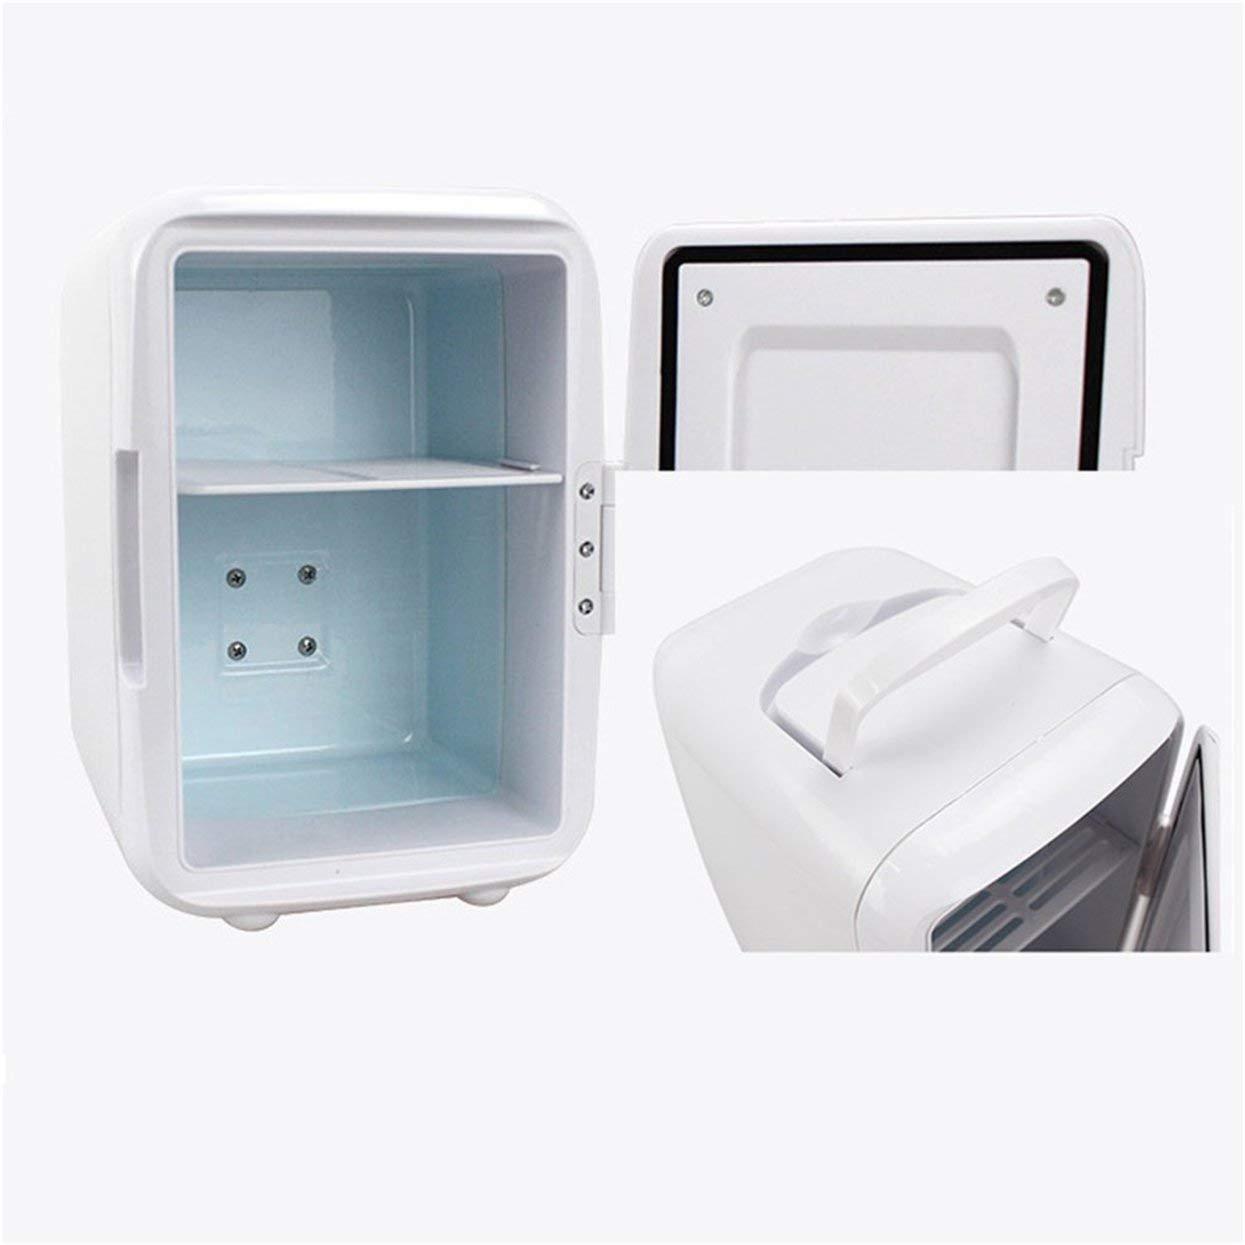 anyilon Dual-Use 4L Home Car Use Refrigerators Ultra Quiet Low Noise Car Mini Refrigerators Freezer Cooling Heating Box Fridge by anyilon (Image #7)